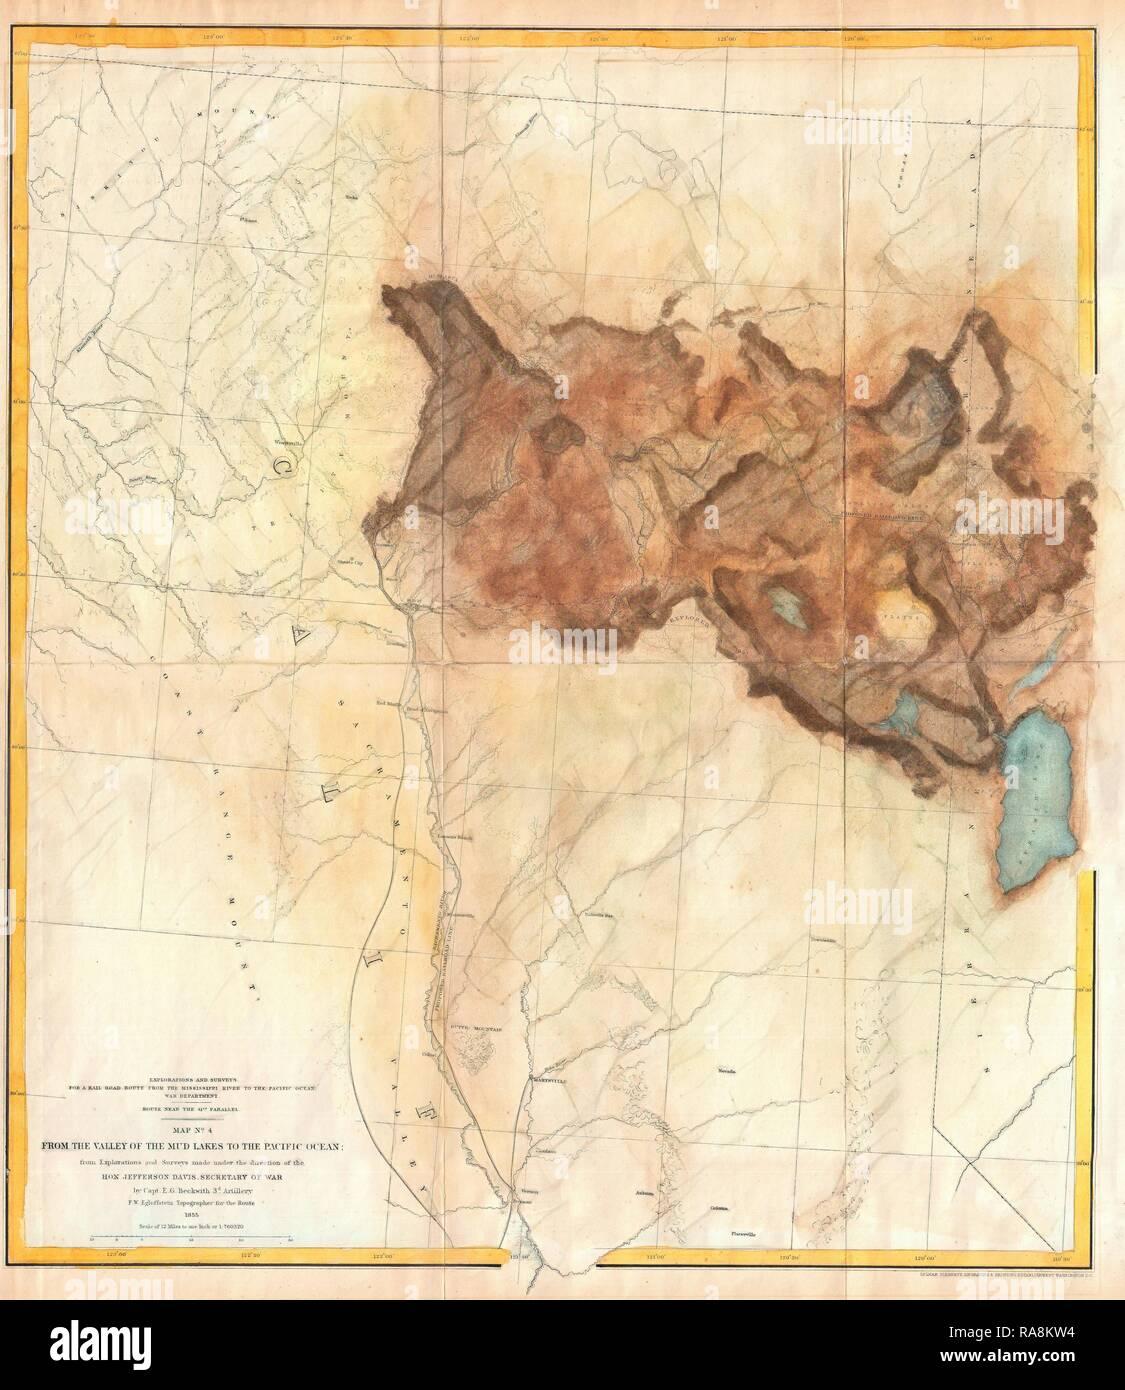 1855, Jefferson Davis Map of California from Pyramid Lake to ... on snake river map, platte river map, missouri river, columbia river, amu darya river map, klamath river, salton sea map, klamath mountains, new orleans river map, california central valley, colorado river map, willamette river, shasta dam, hudson river, feather river, delaware river, south yuba river map, san joaquin river, hudson river map, mississippi river, folsom lake, san francisco bay, james river, ohio river map, shasta lake, fraser river map, sacramento valley, potomac river map, brazos river map, saint lawrence river map, tennessee river map, yellowstone river map, sierra nevada, gila river map, arkansas river map, american river, san joaquin map, altamaha river map, ohio river, columbia river map,